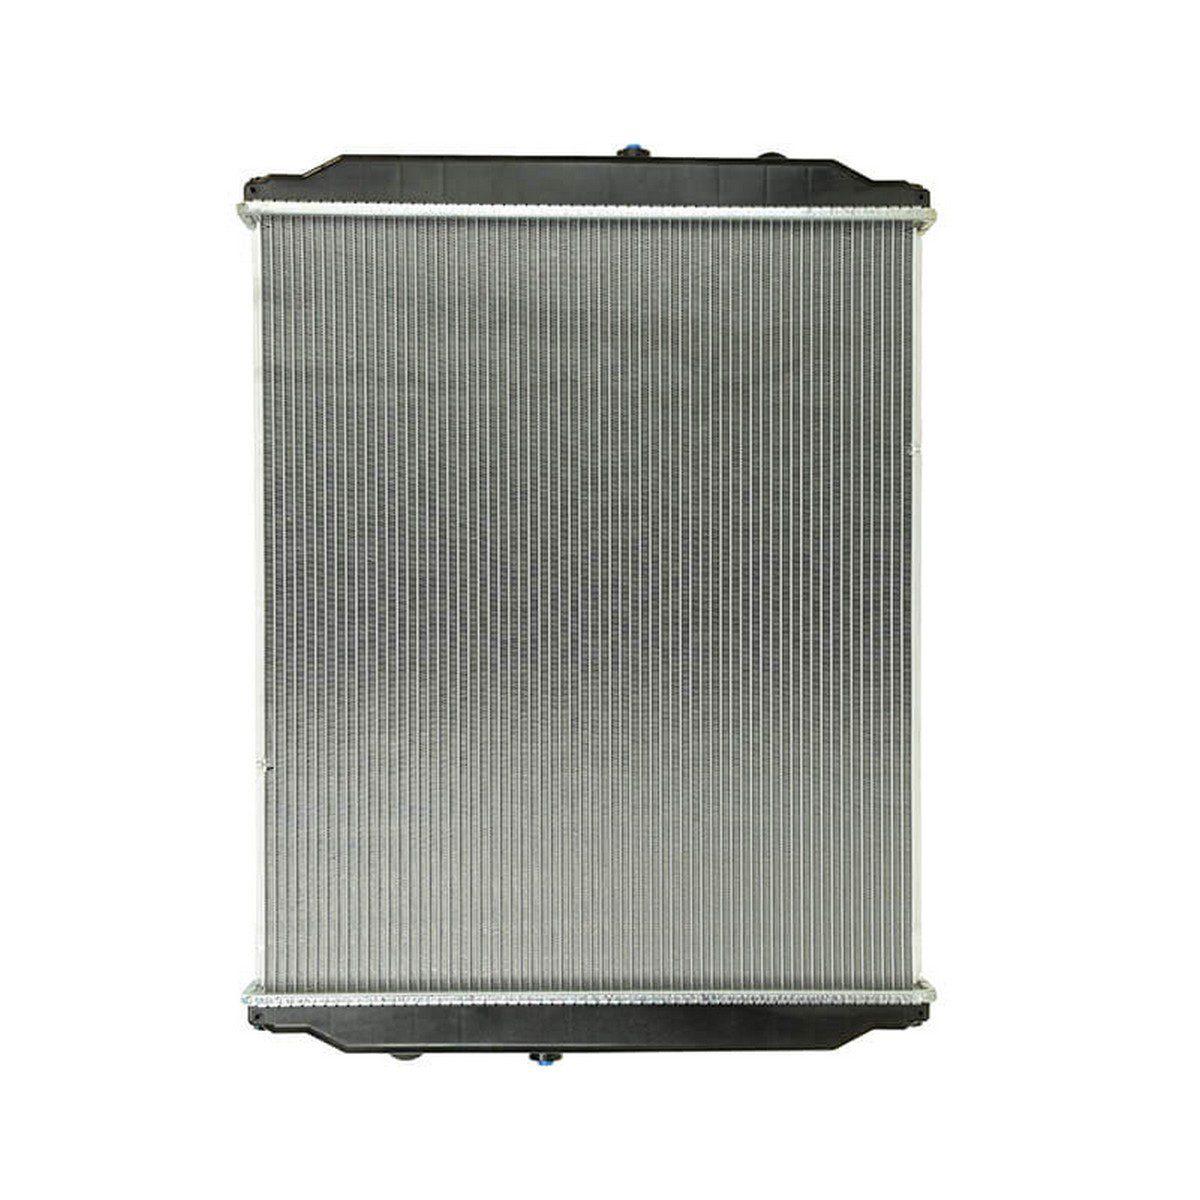 bluebird bus 94 99 radiator oem 1768688 2